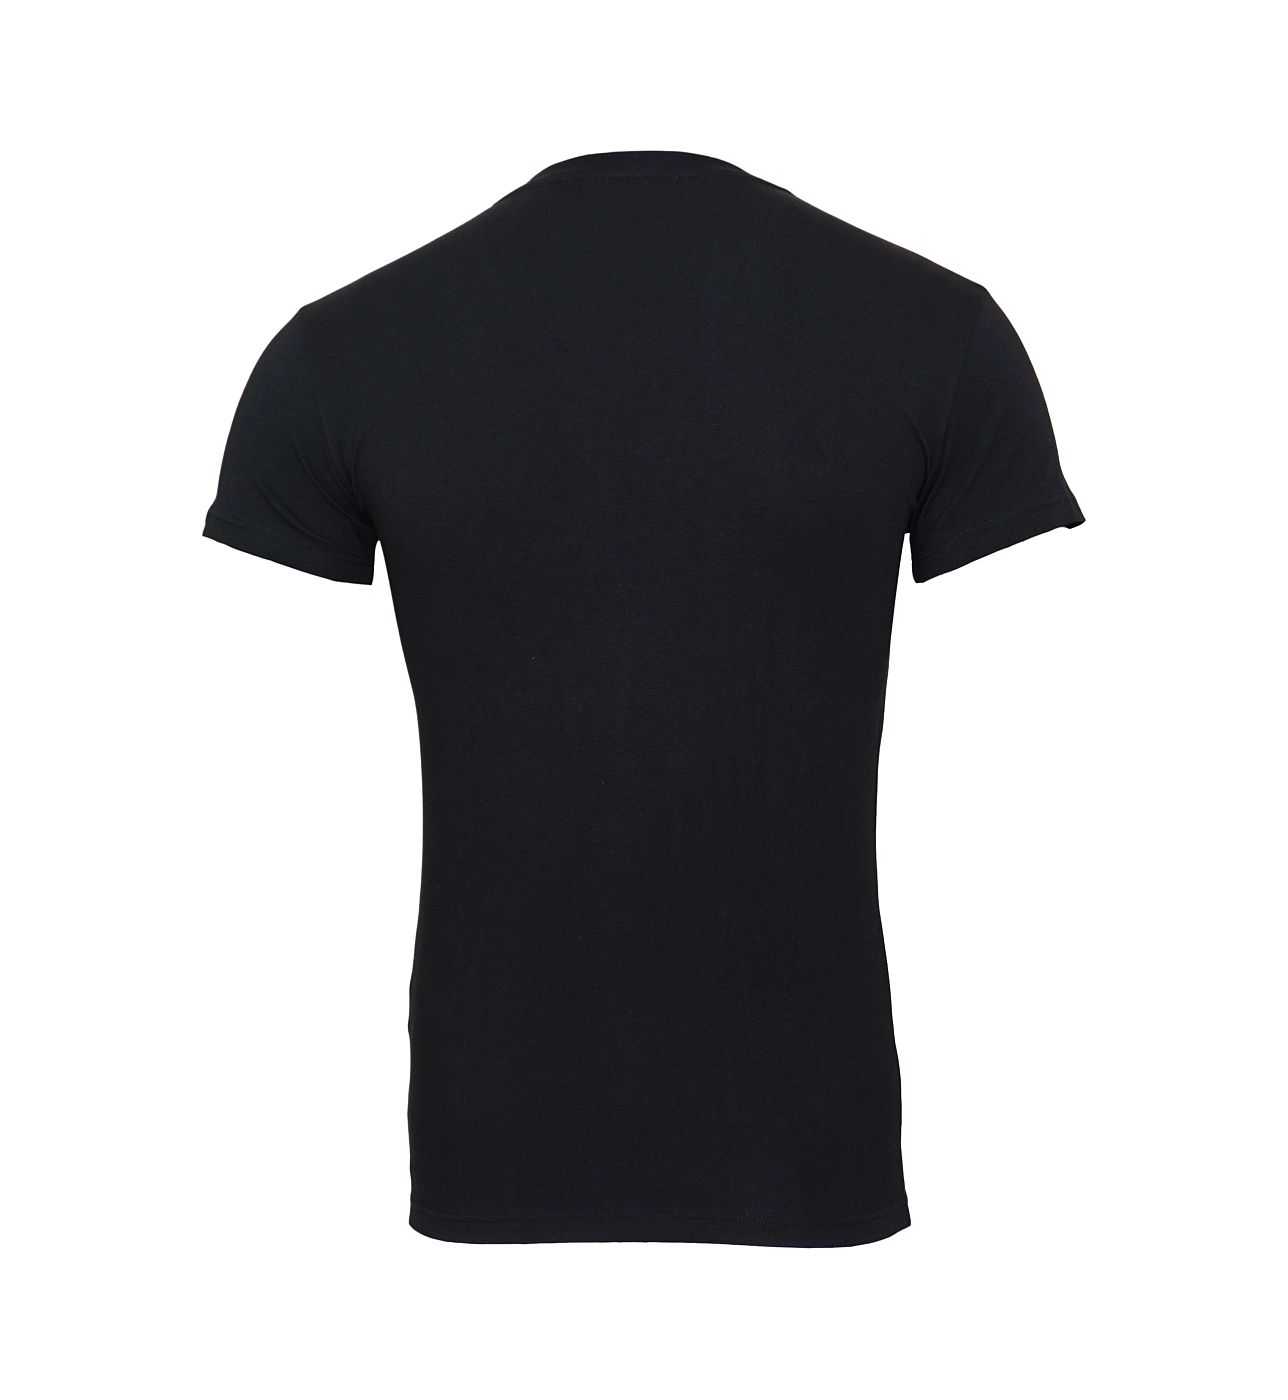 Emporio Armani T-Shirts V-Ausschnitt 110810 8A516 00020 NERO SH18-EAT2